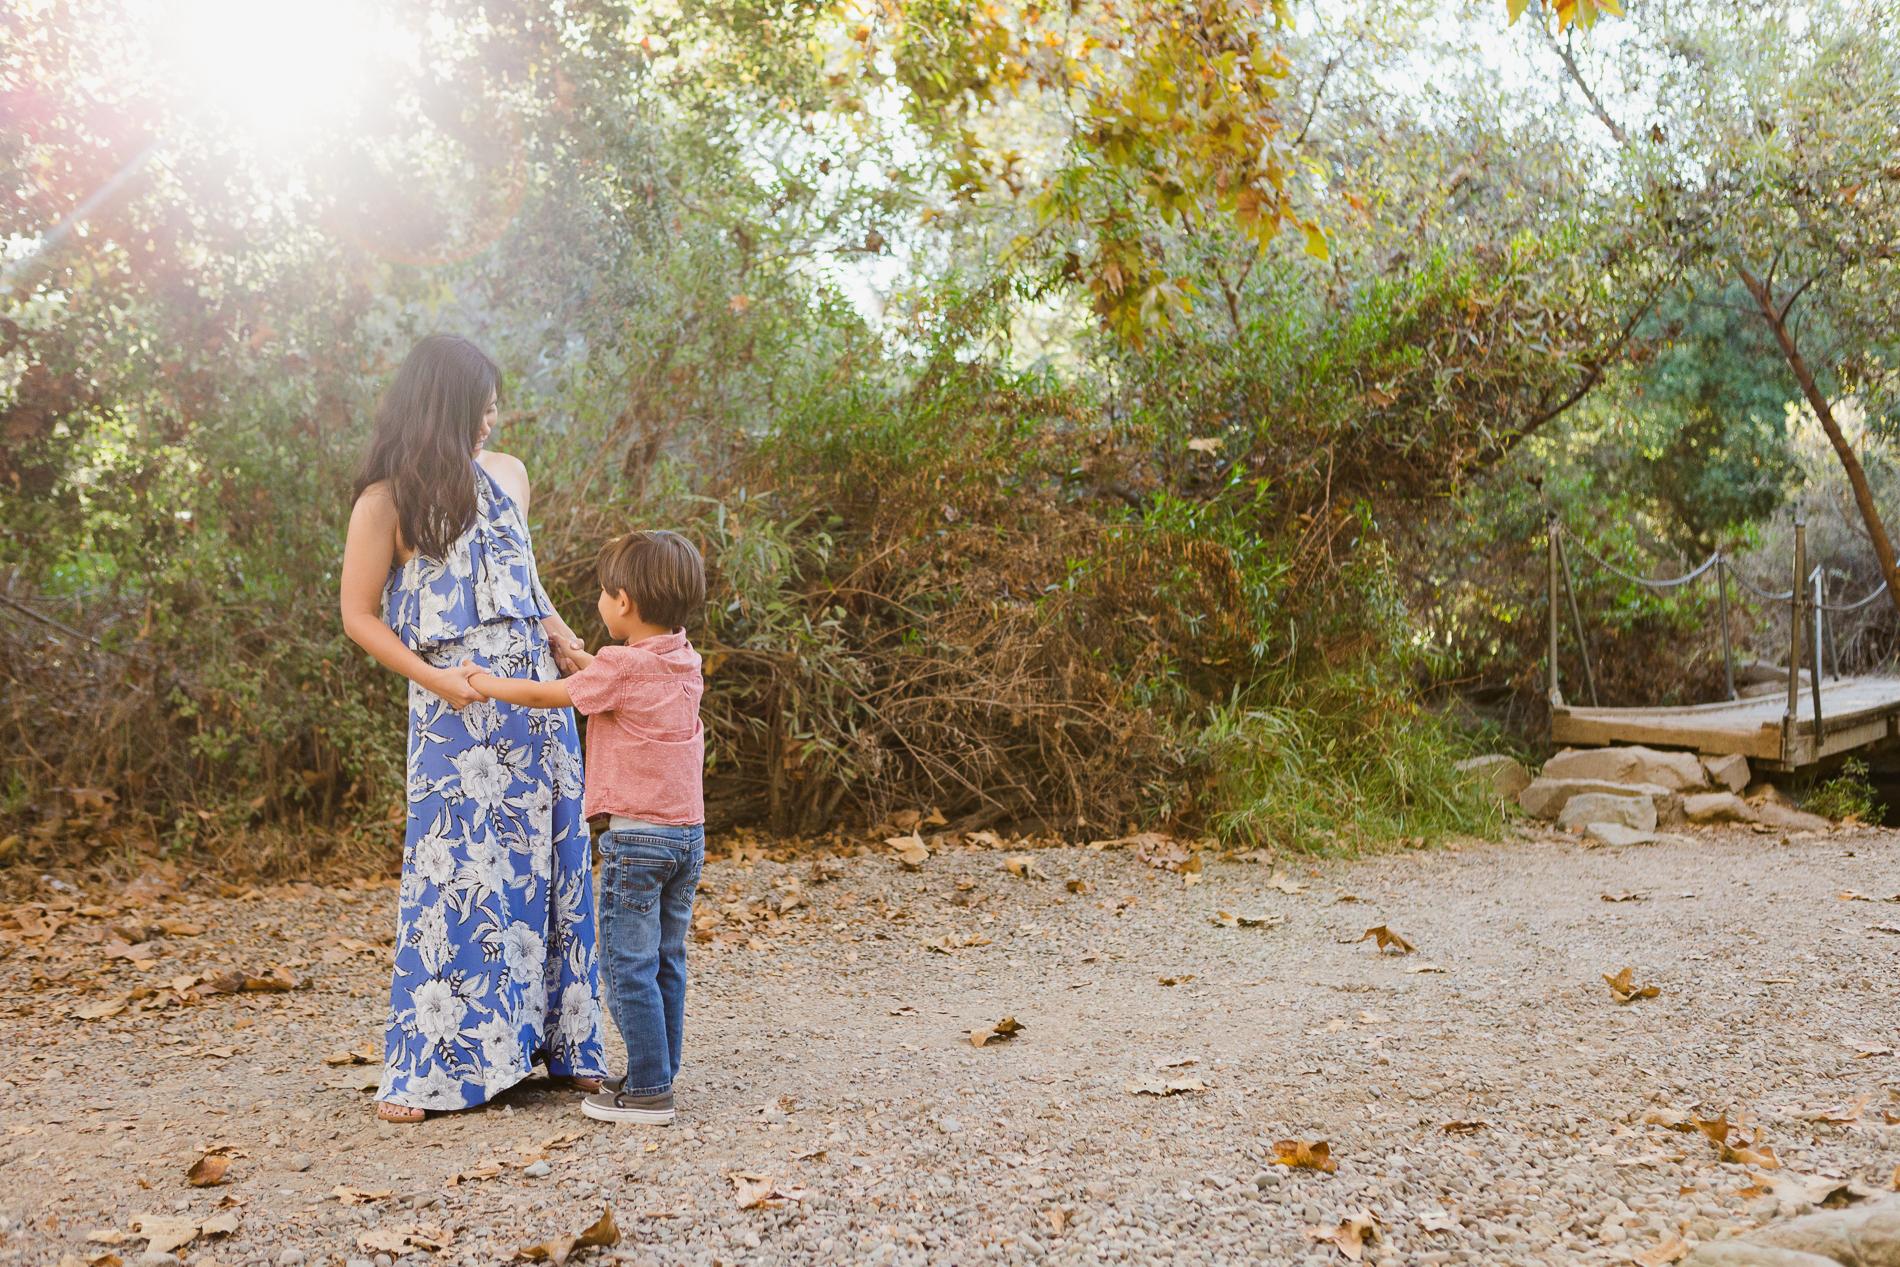 San Diego Family Photographer Los Penasquitos Canyon Christine Dammann Photography-26.jpg